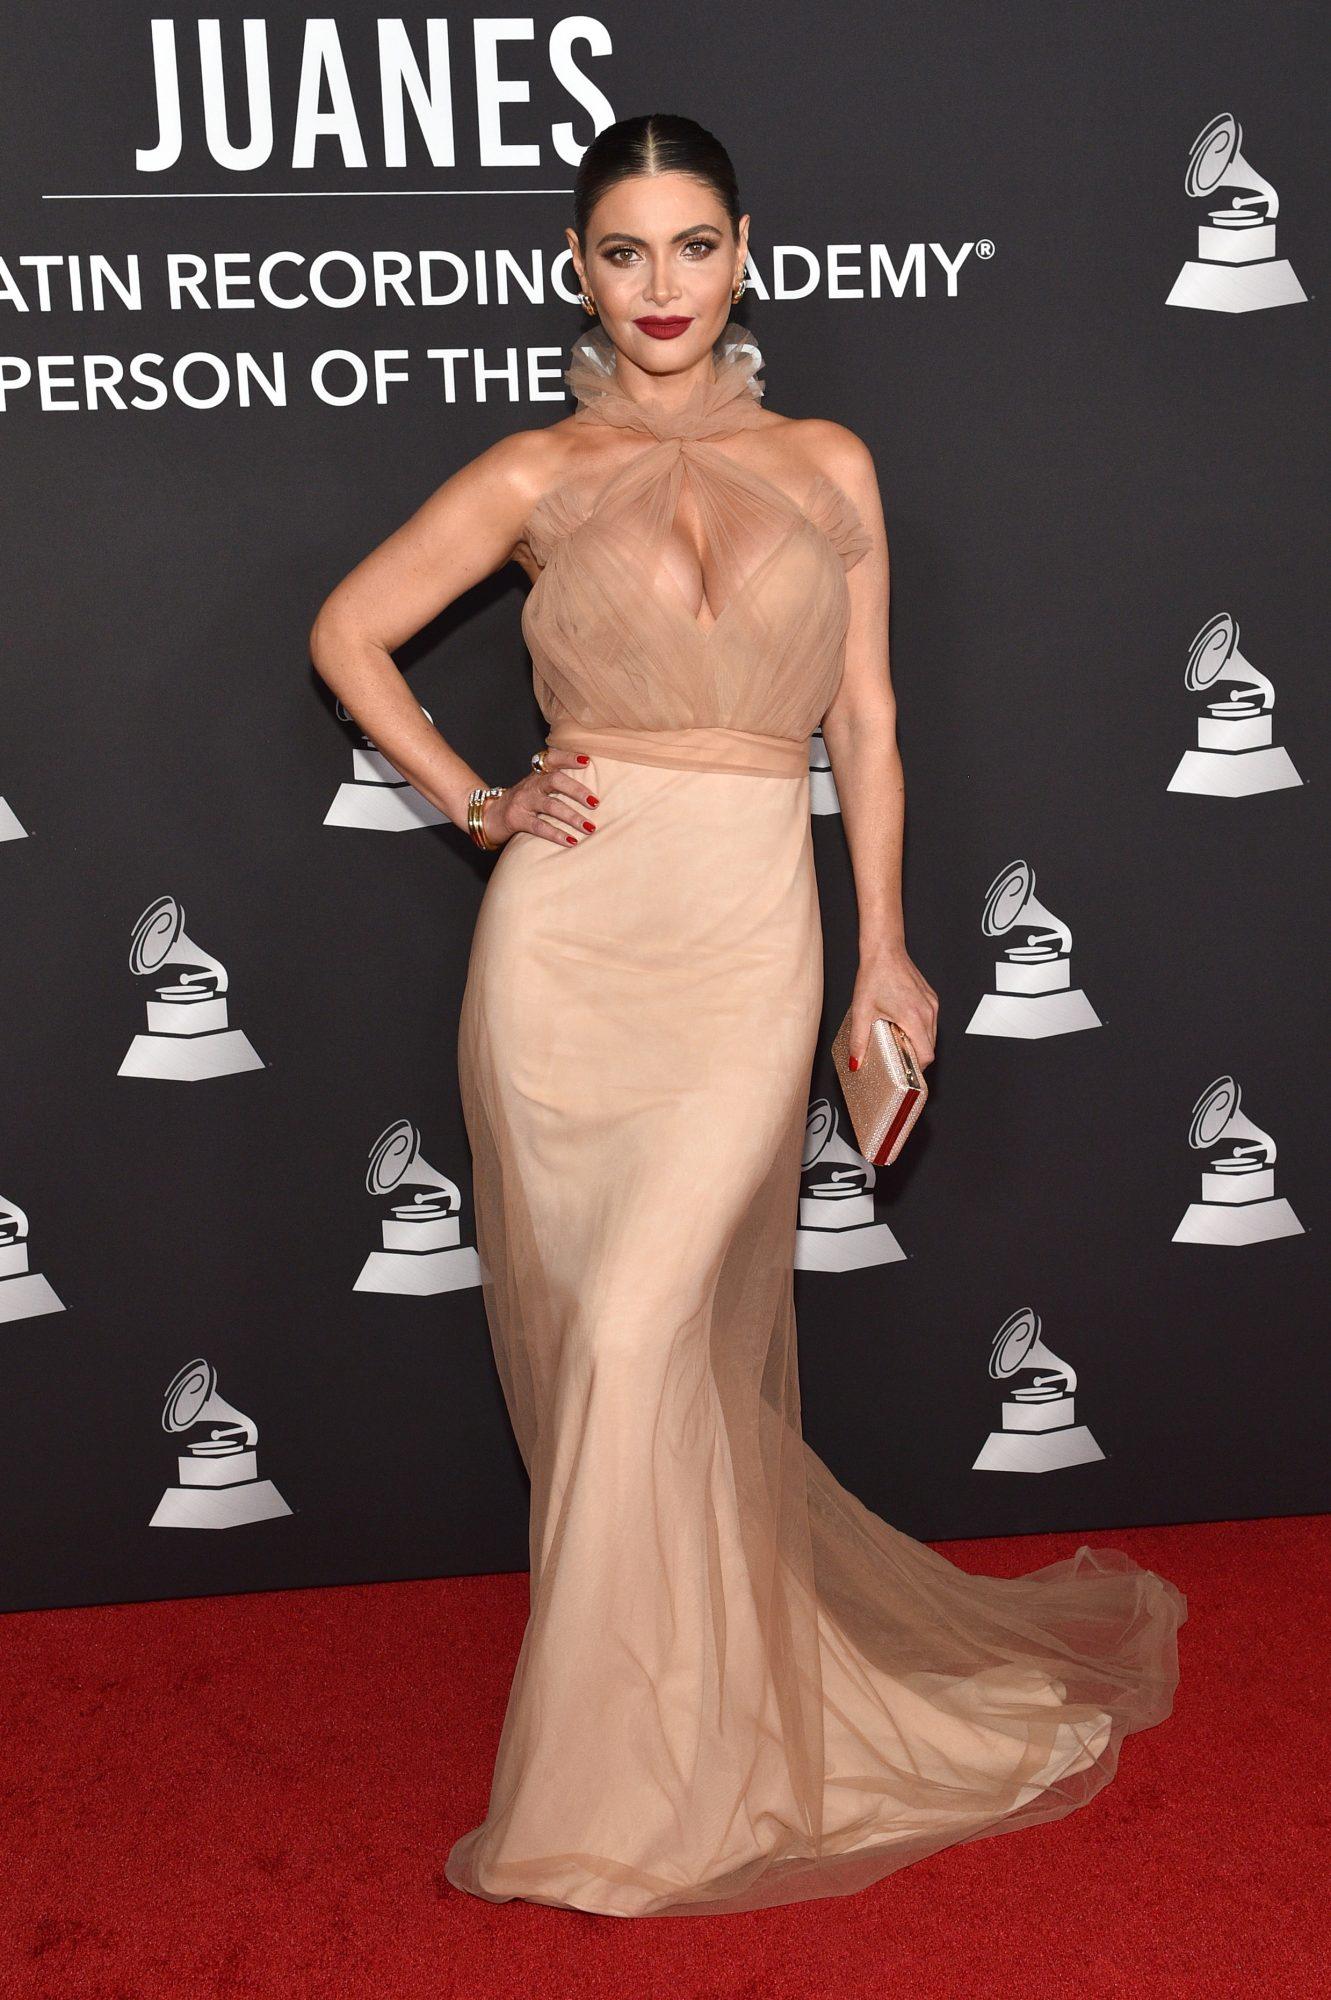 Chiquinquira Delgado, look, persona del ano, Latin Grammy, Las vegas